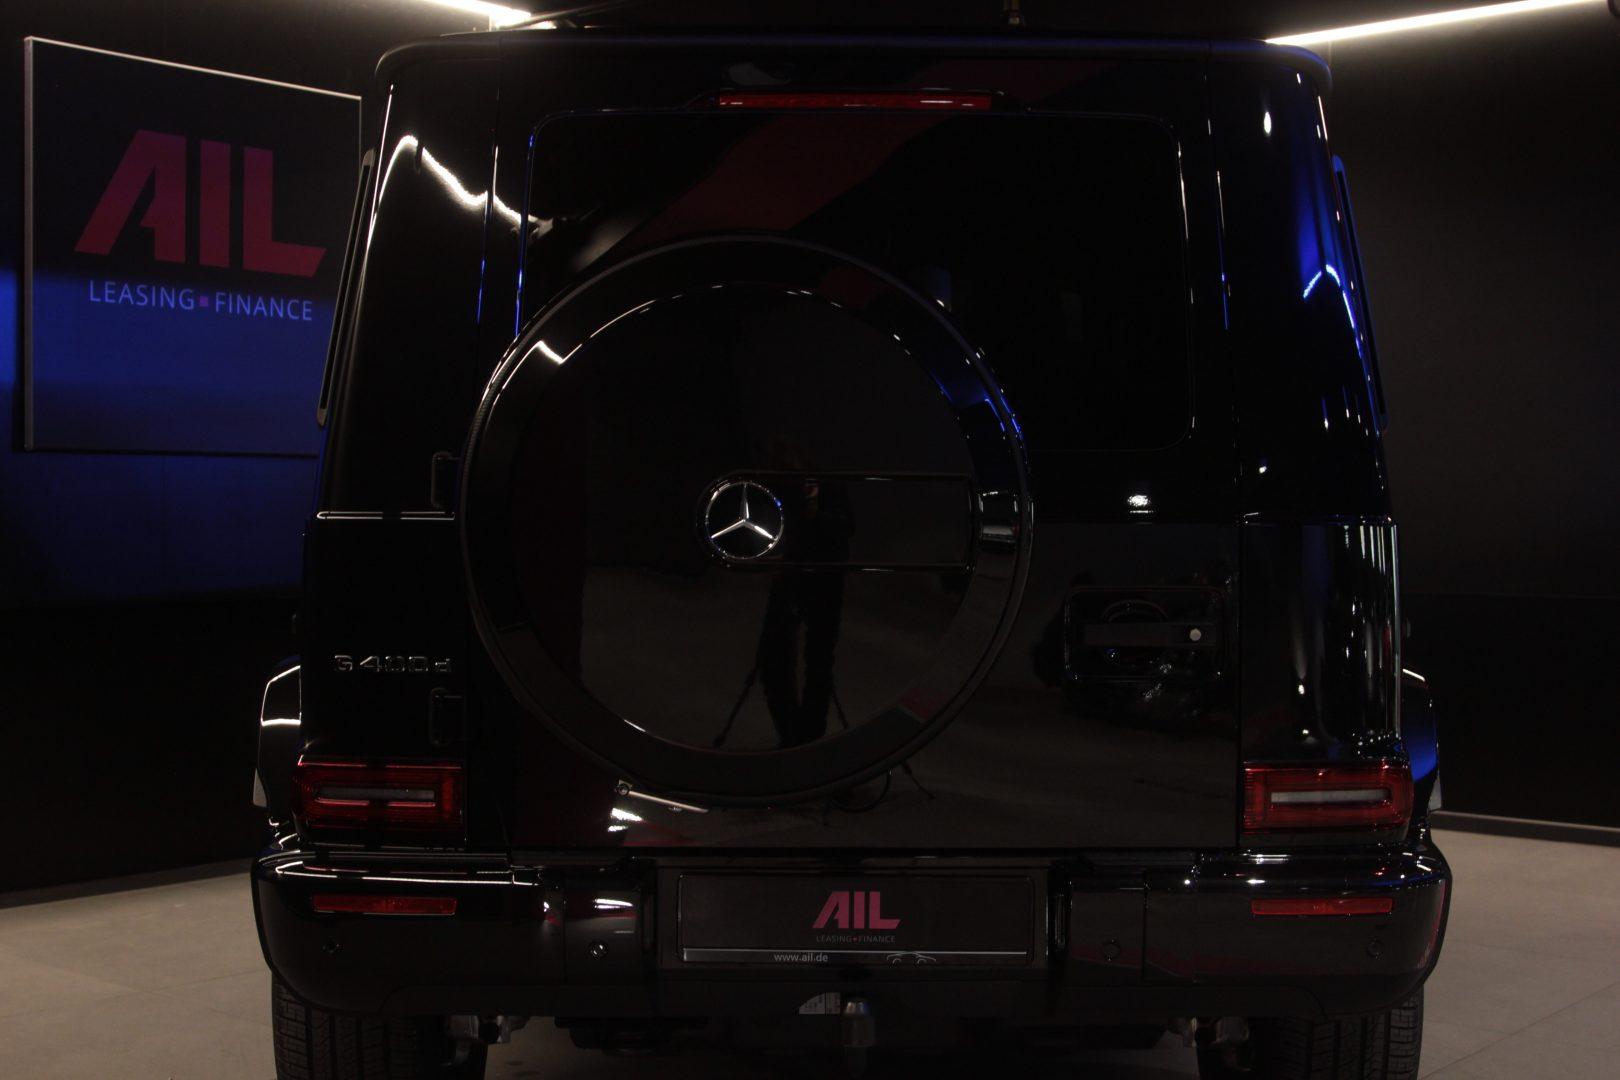 AIL Mercedes-Benz G 400 d Stronger than time Edition 1